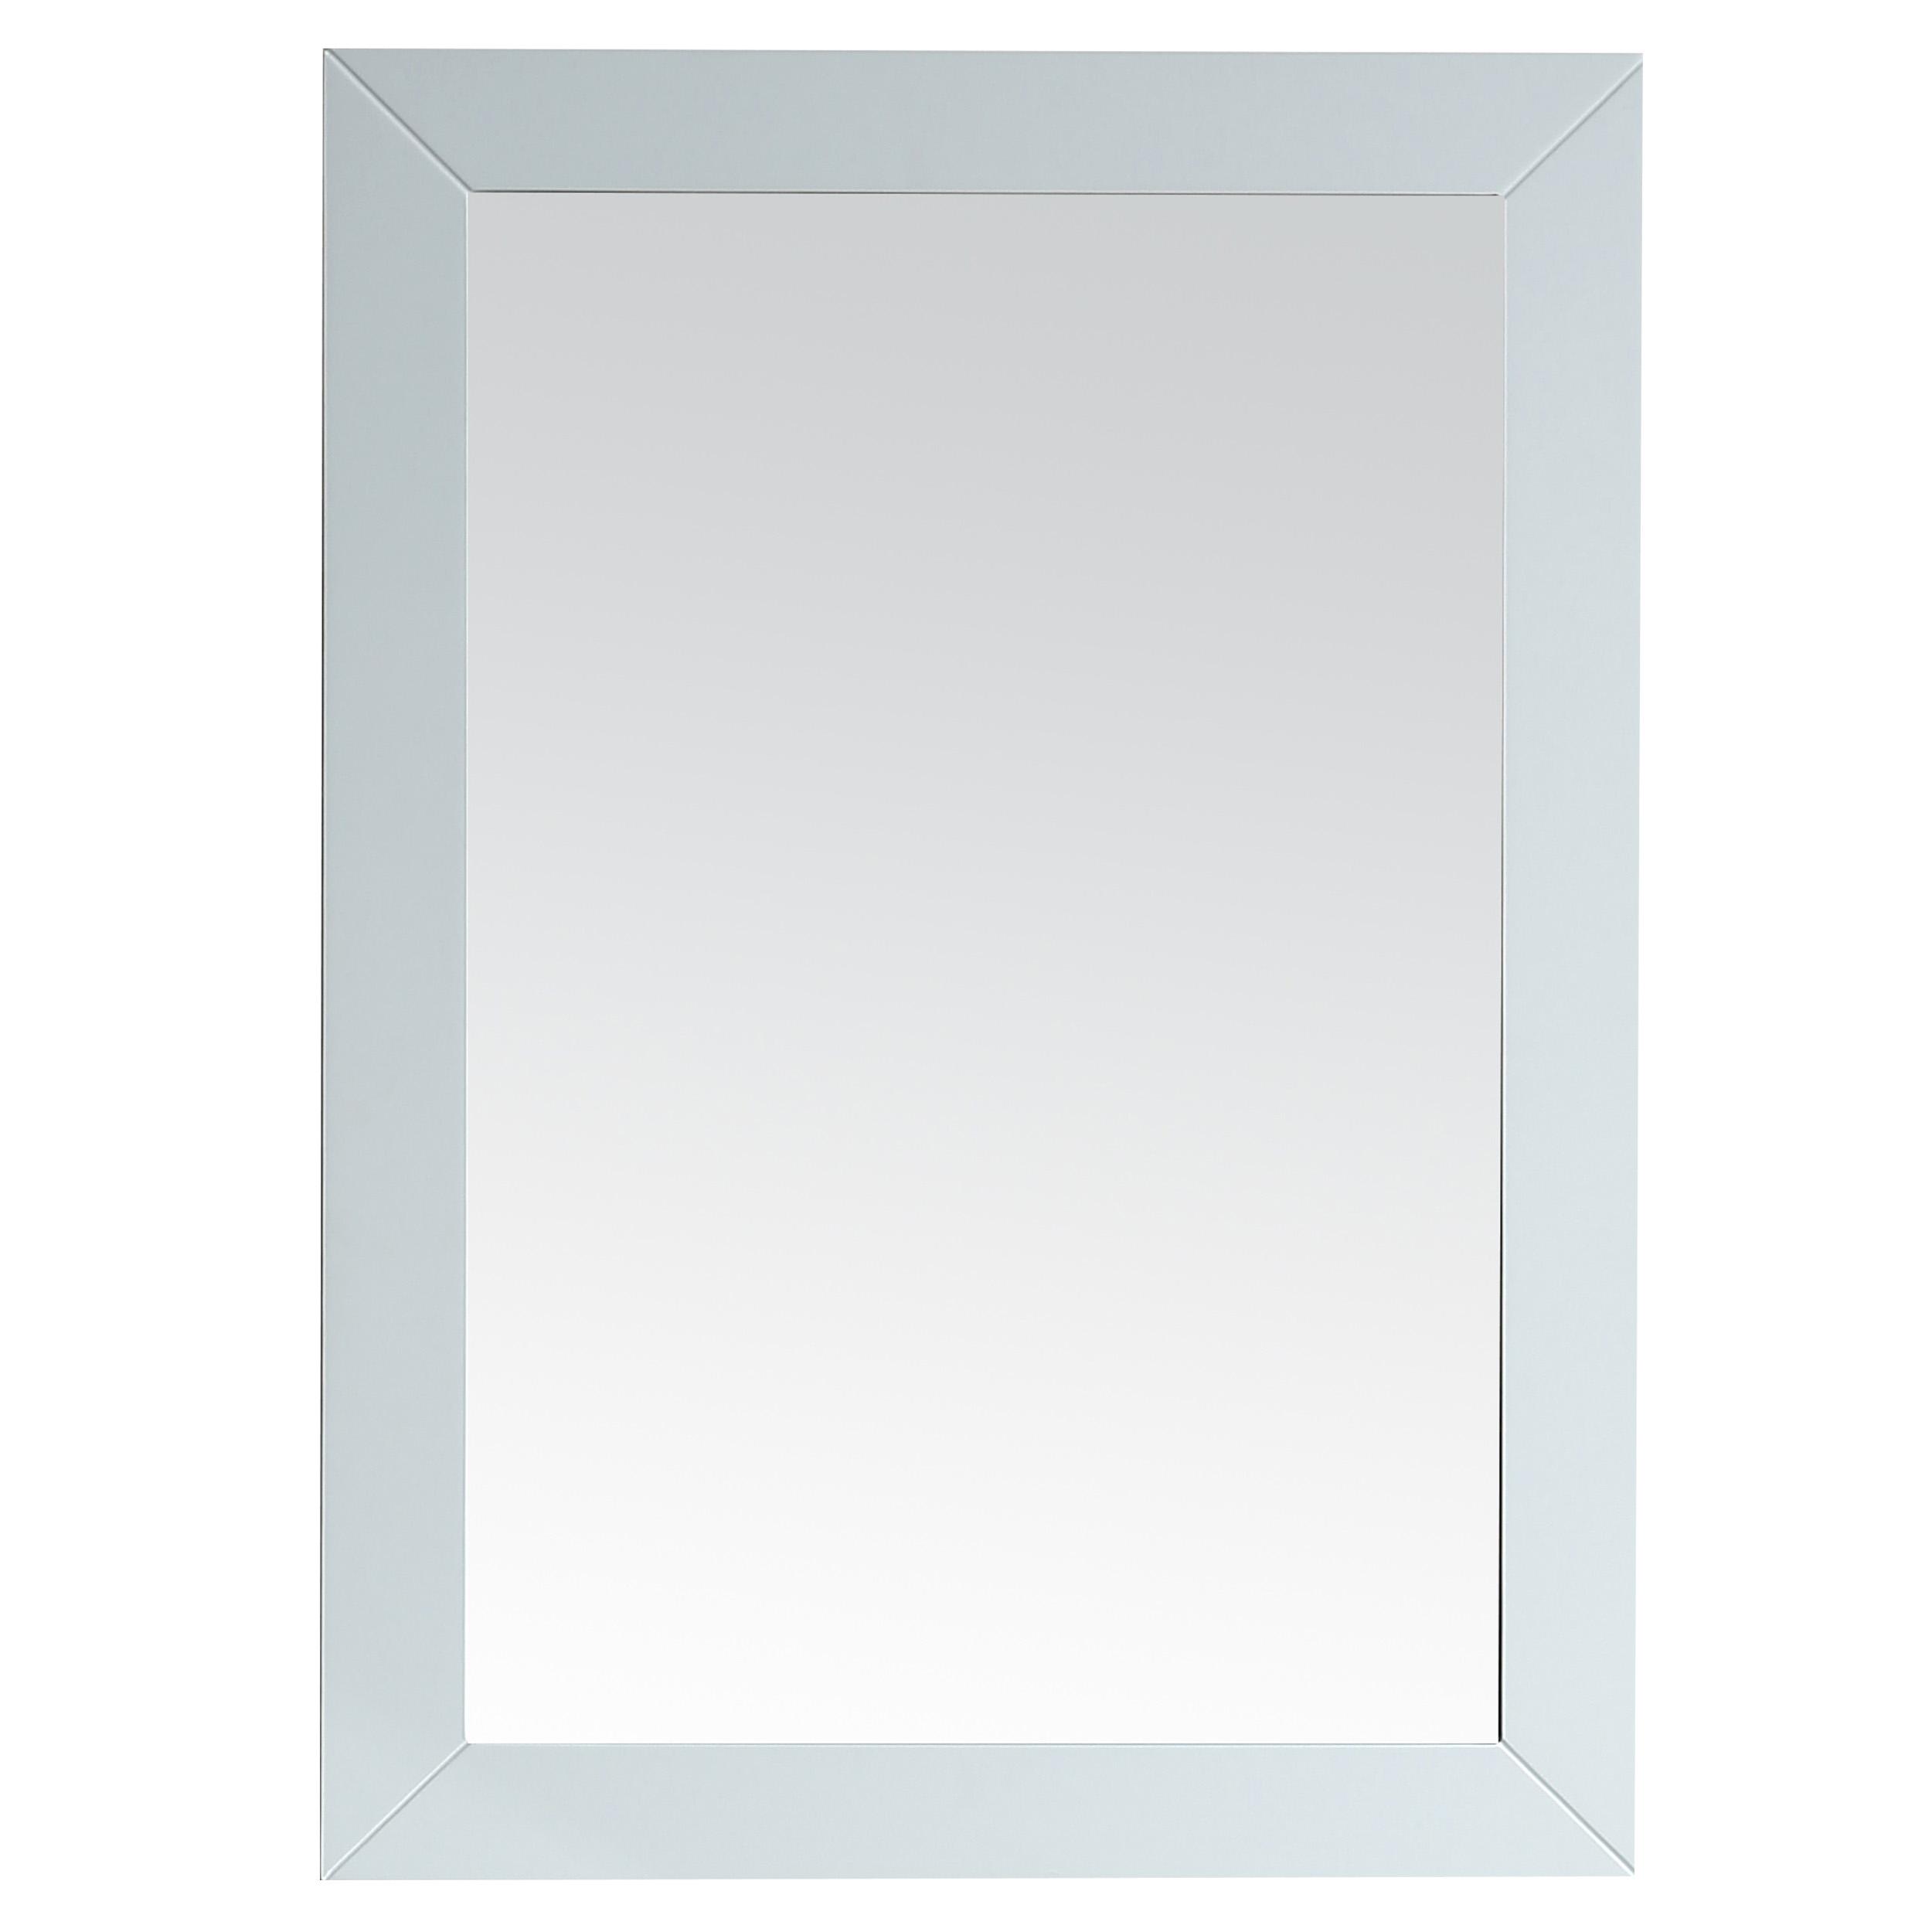 EVMR69 30WH A Main - Eviva Acclaim Transitional White Bathroom Vanity Mirror